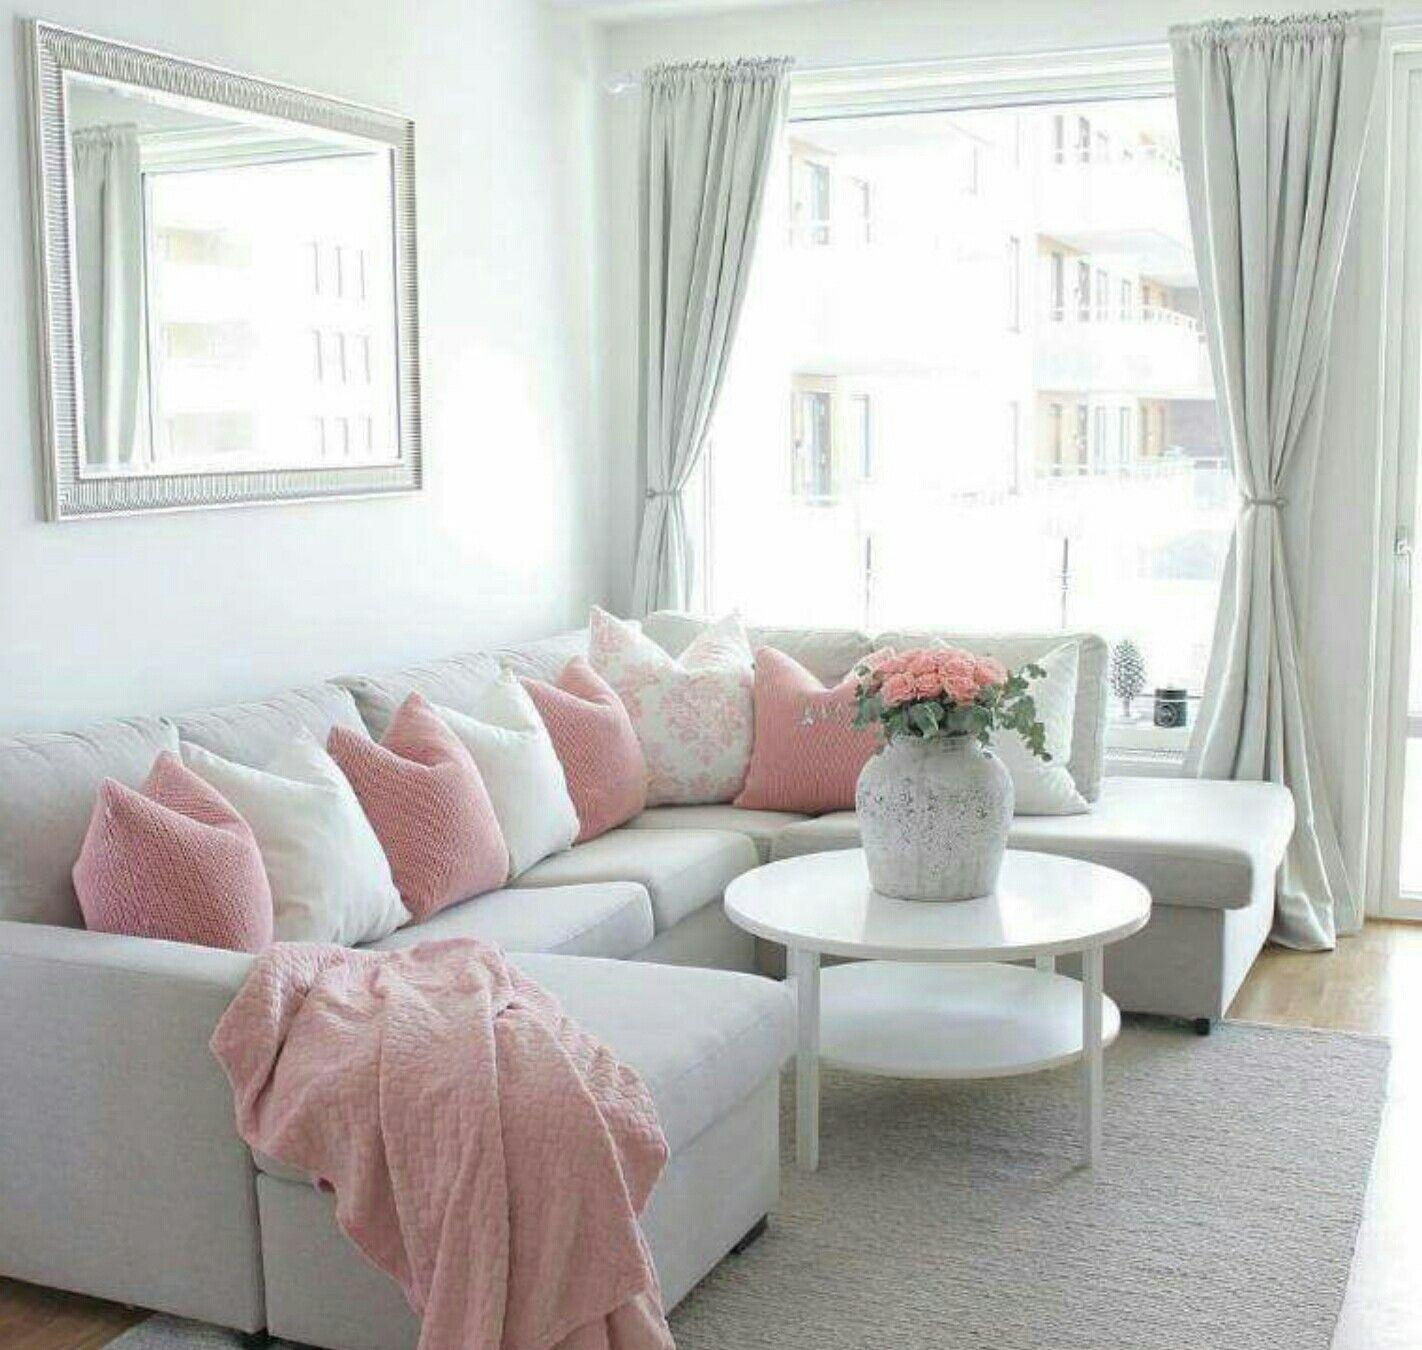 Pin by Marija Ostojic on living room | Pinterest | Kitchen colors ...